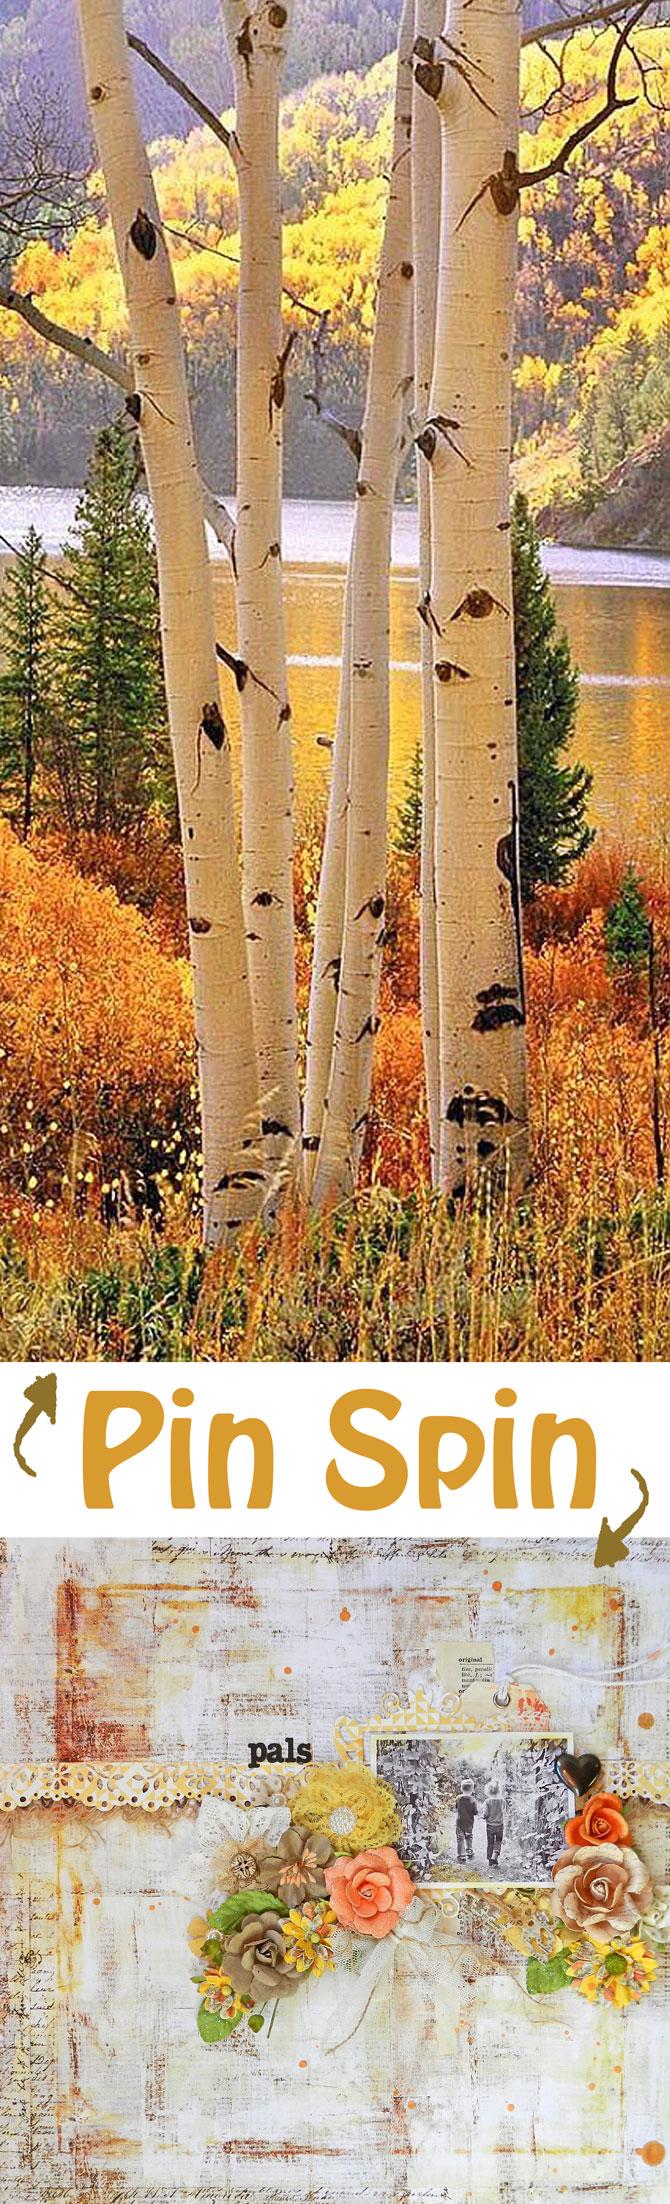 Oct-29-pinspin-erinweb